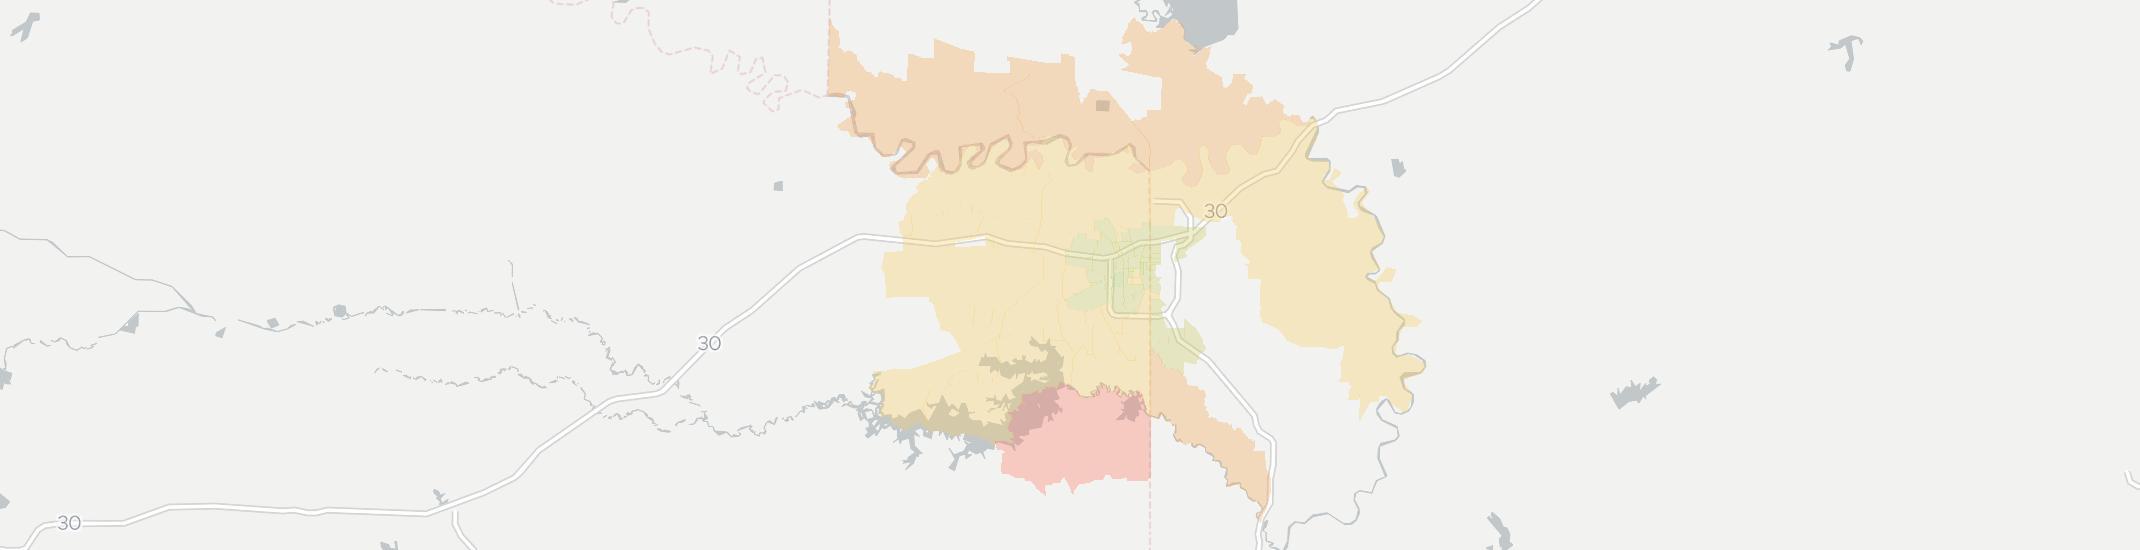 Texarkana Tx Zip Code Map.Internet In Texarkana Tx See All 12 Internet Providers